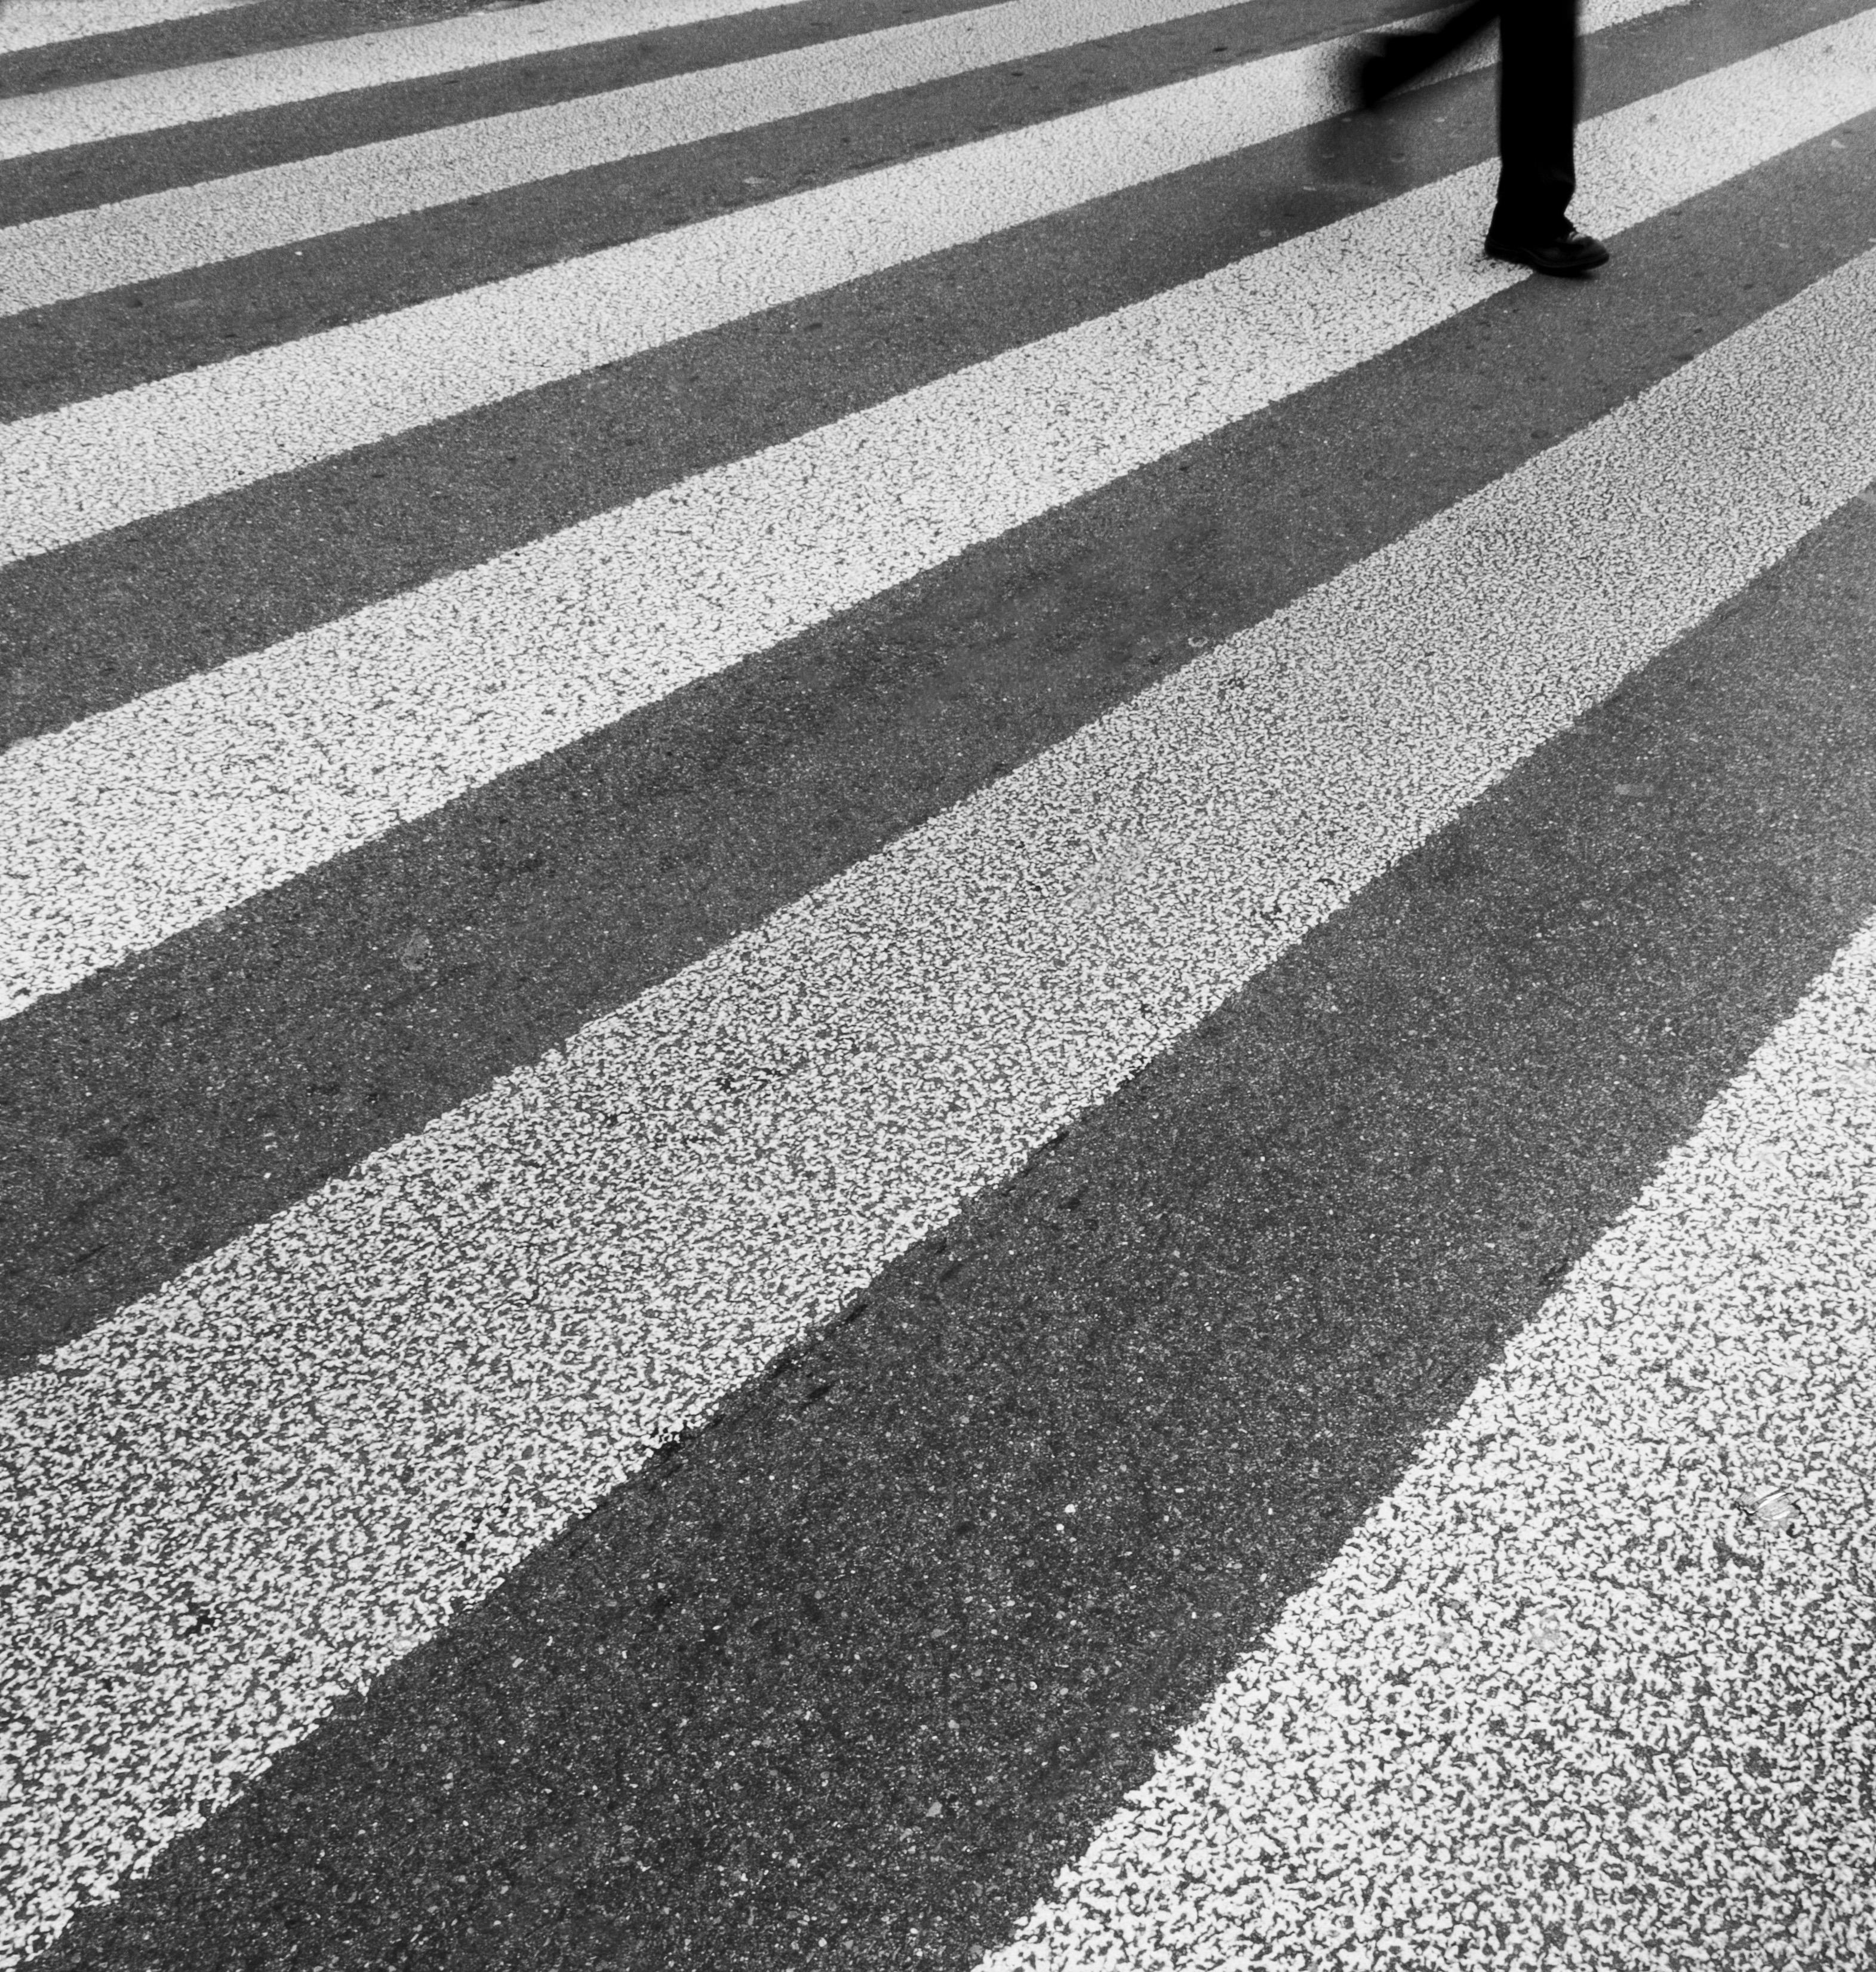 Free Images : Black And White, Street, Sidewalk, Floor